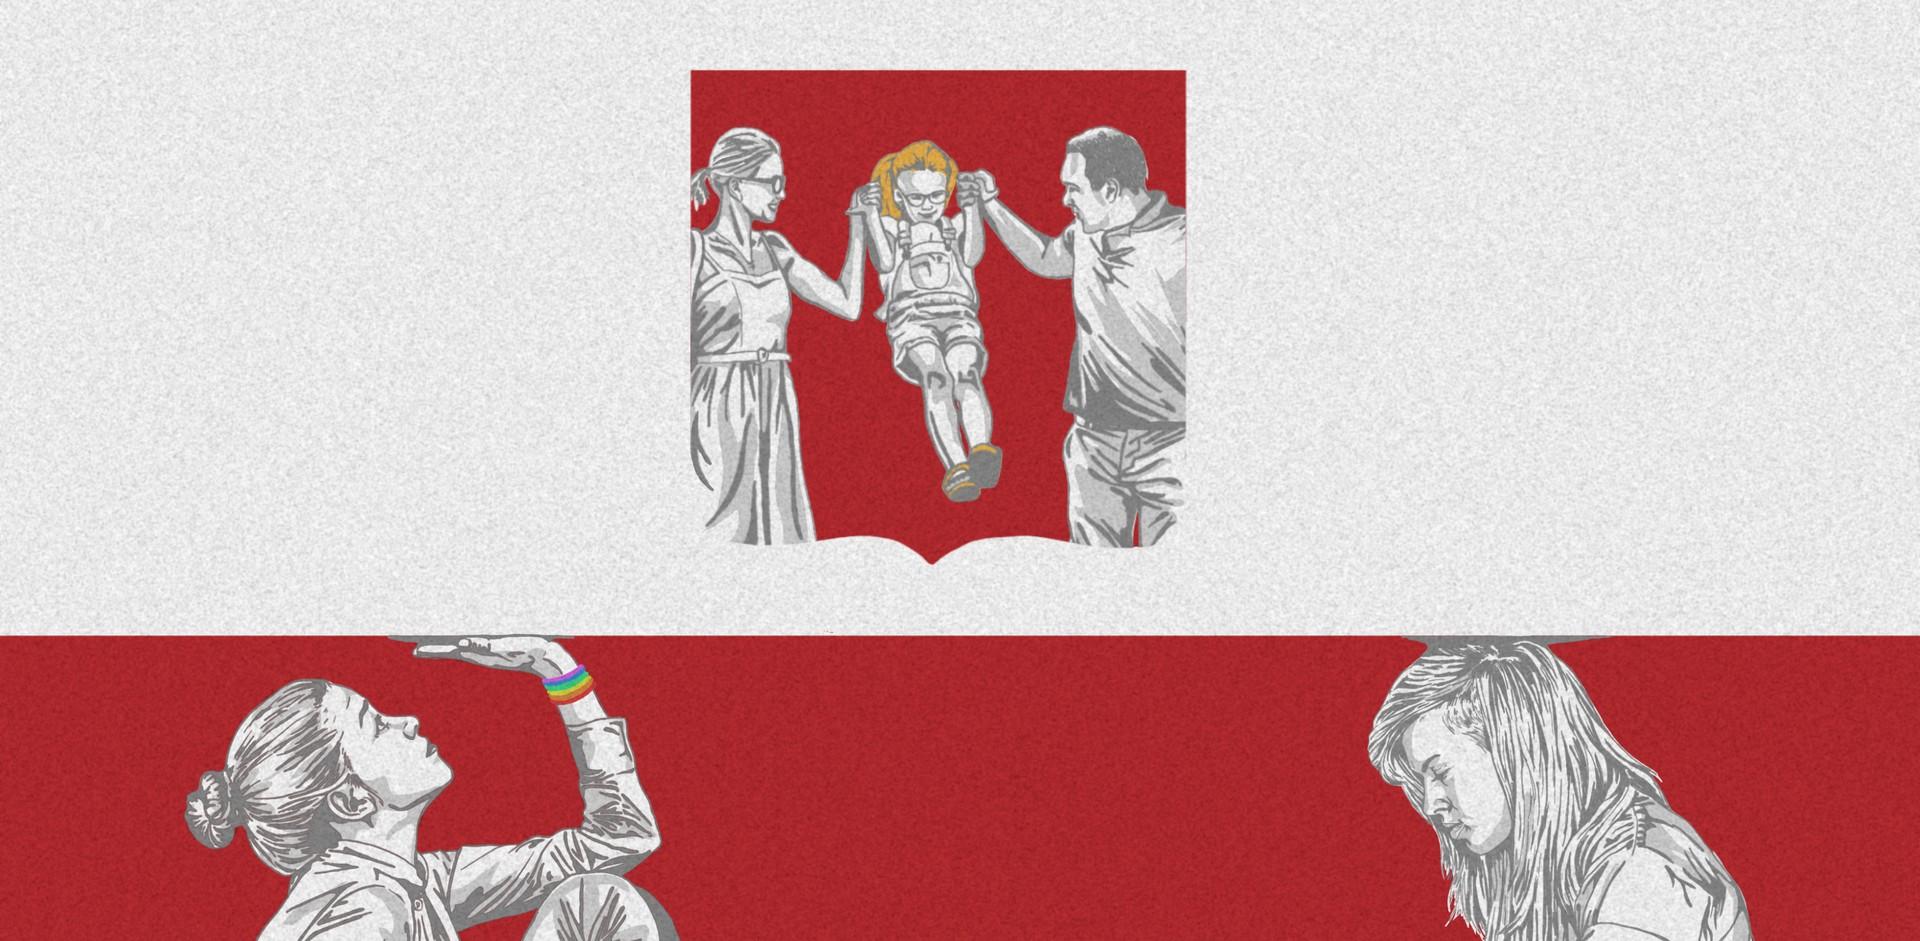 An illustration of the Polish flag